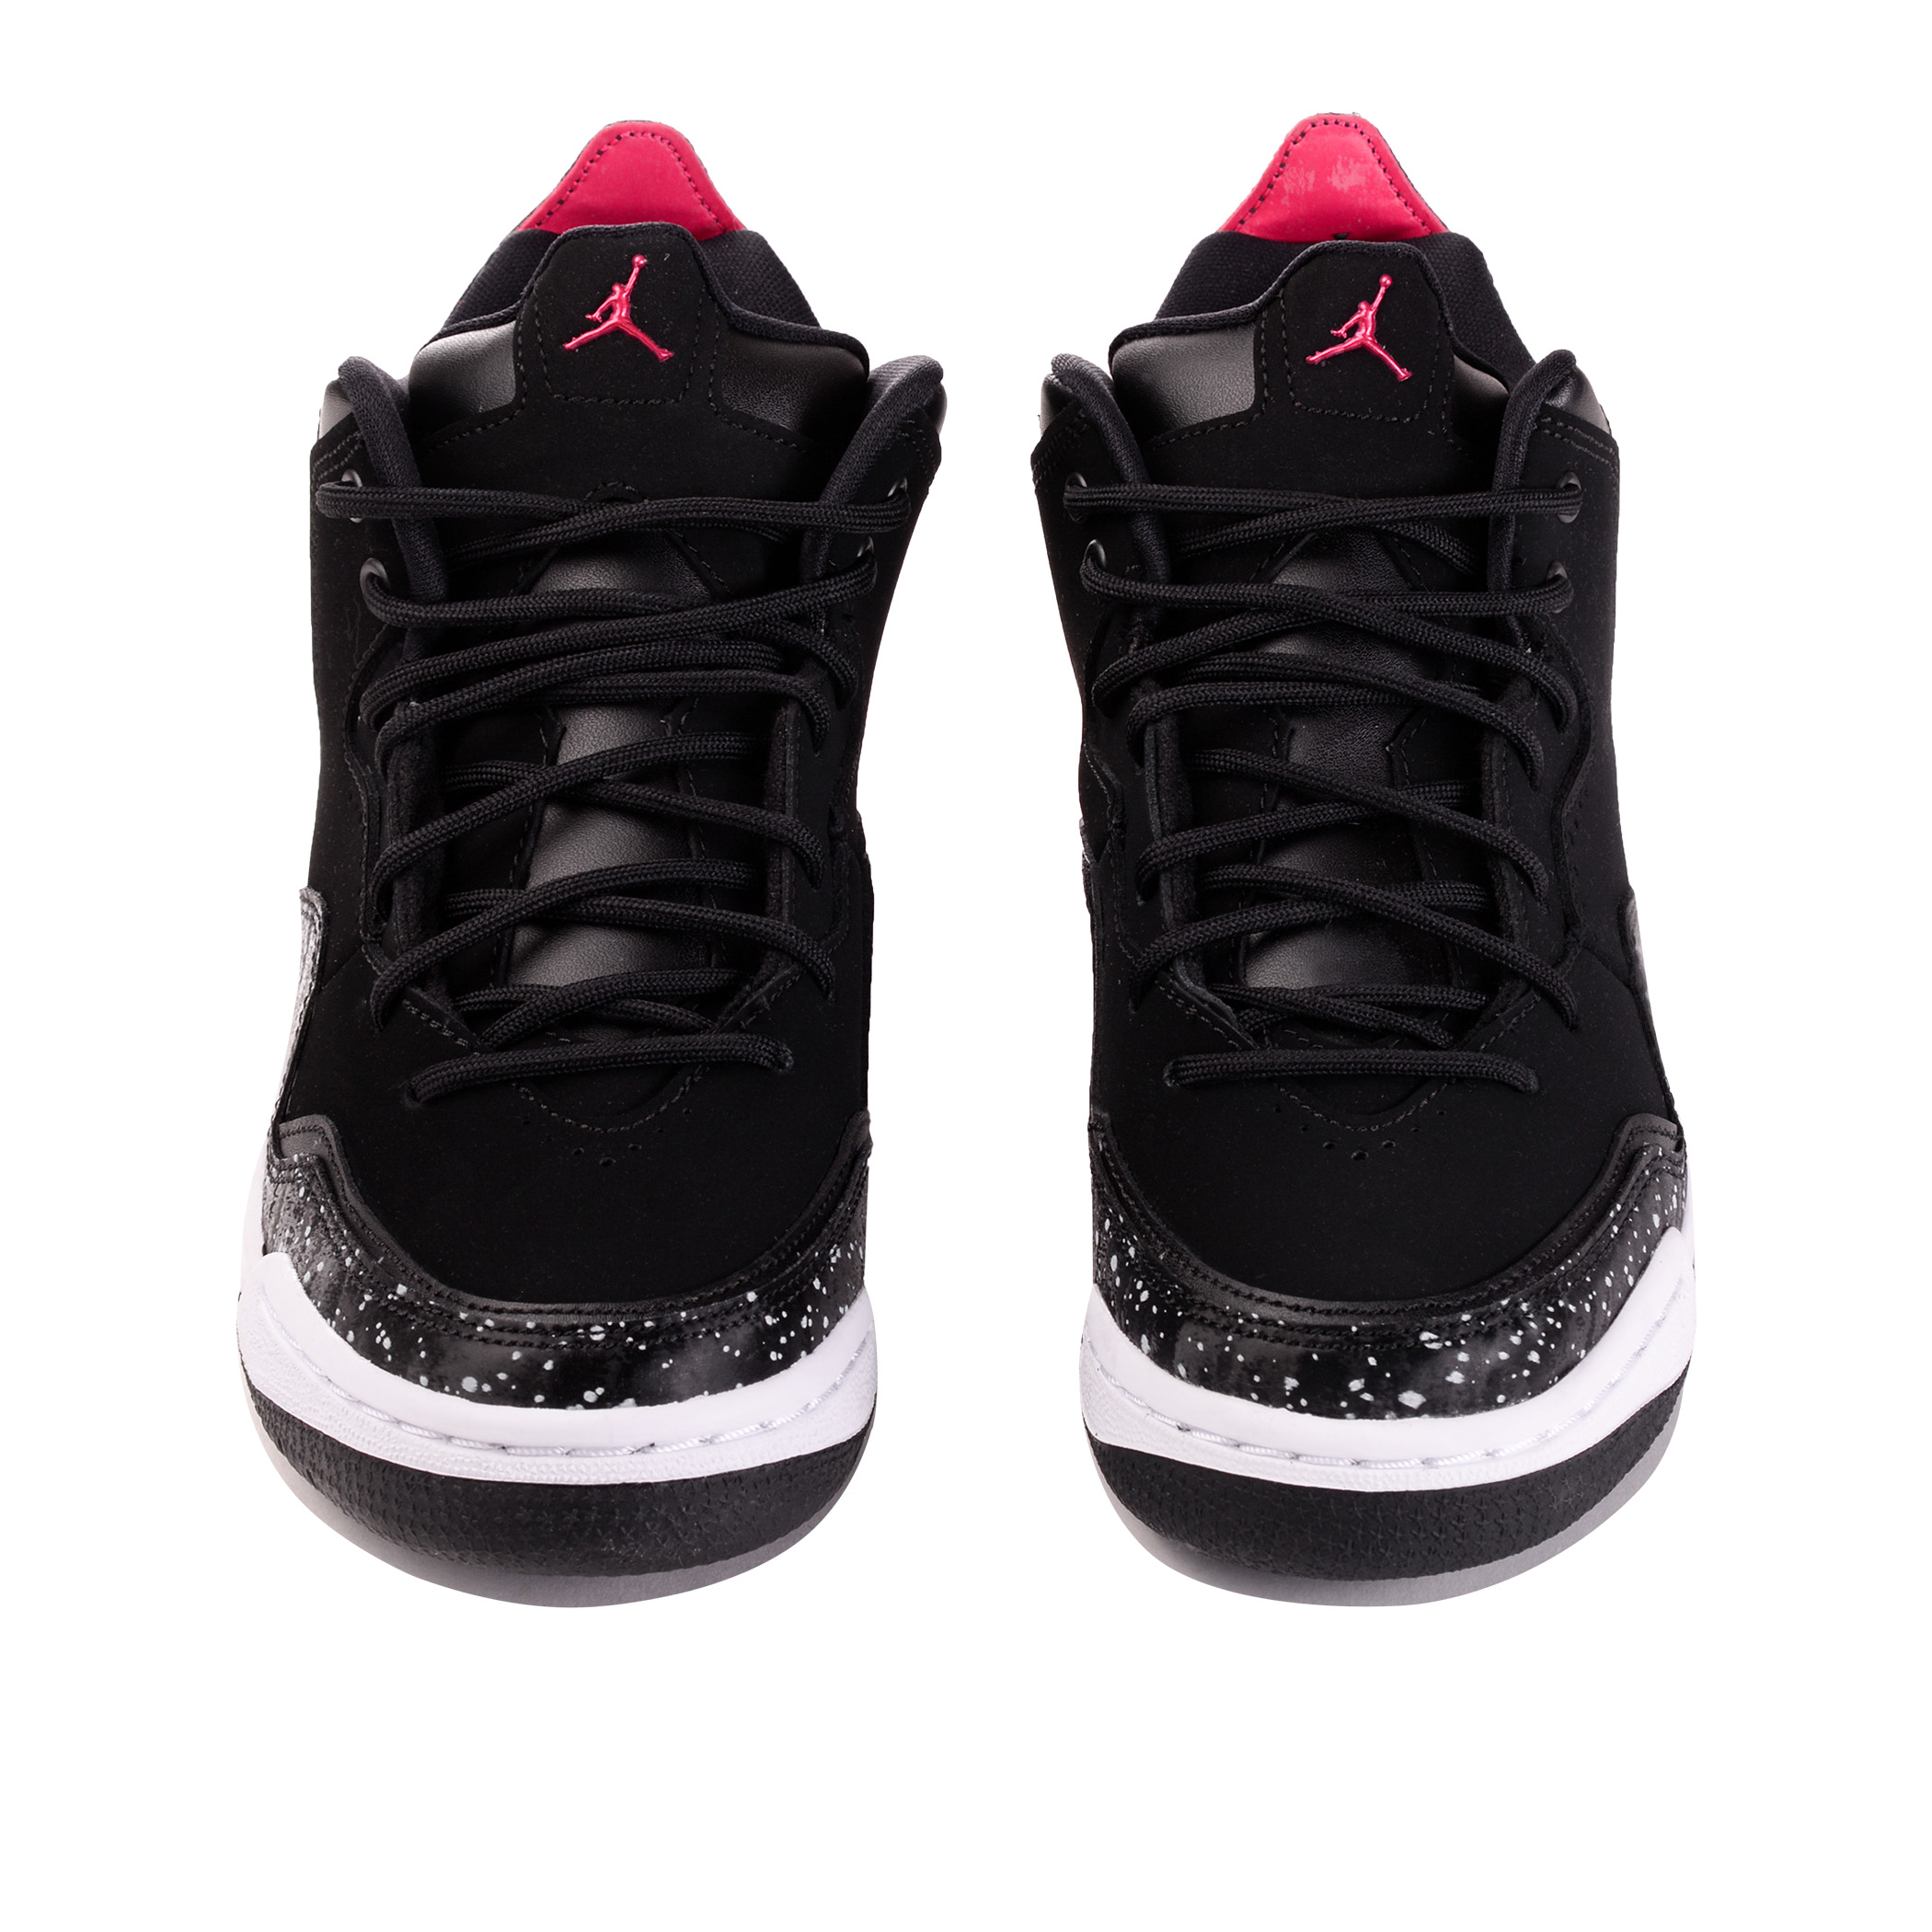 e0548fd1 Подростковые кроссовки Jordan Courtside 23 (GS) Black/White-Rush Pink - фото